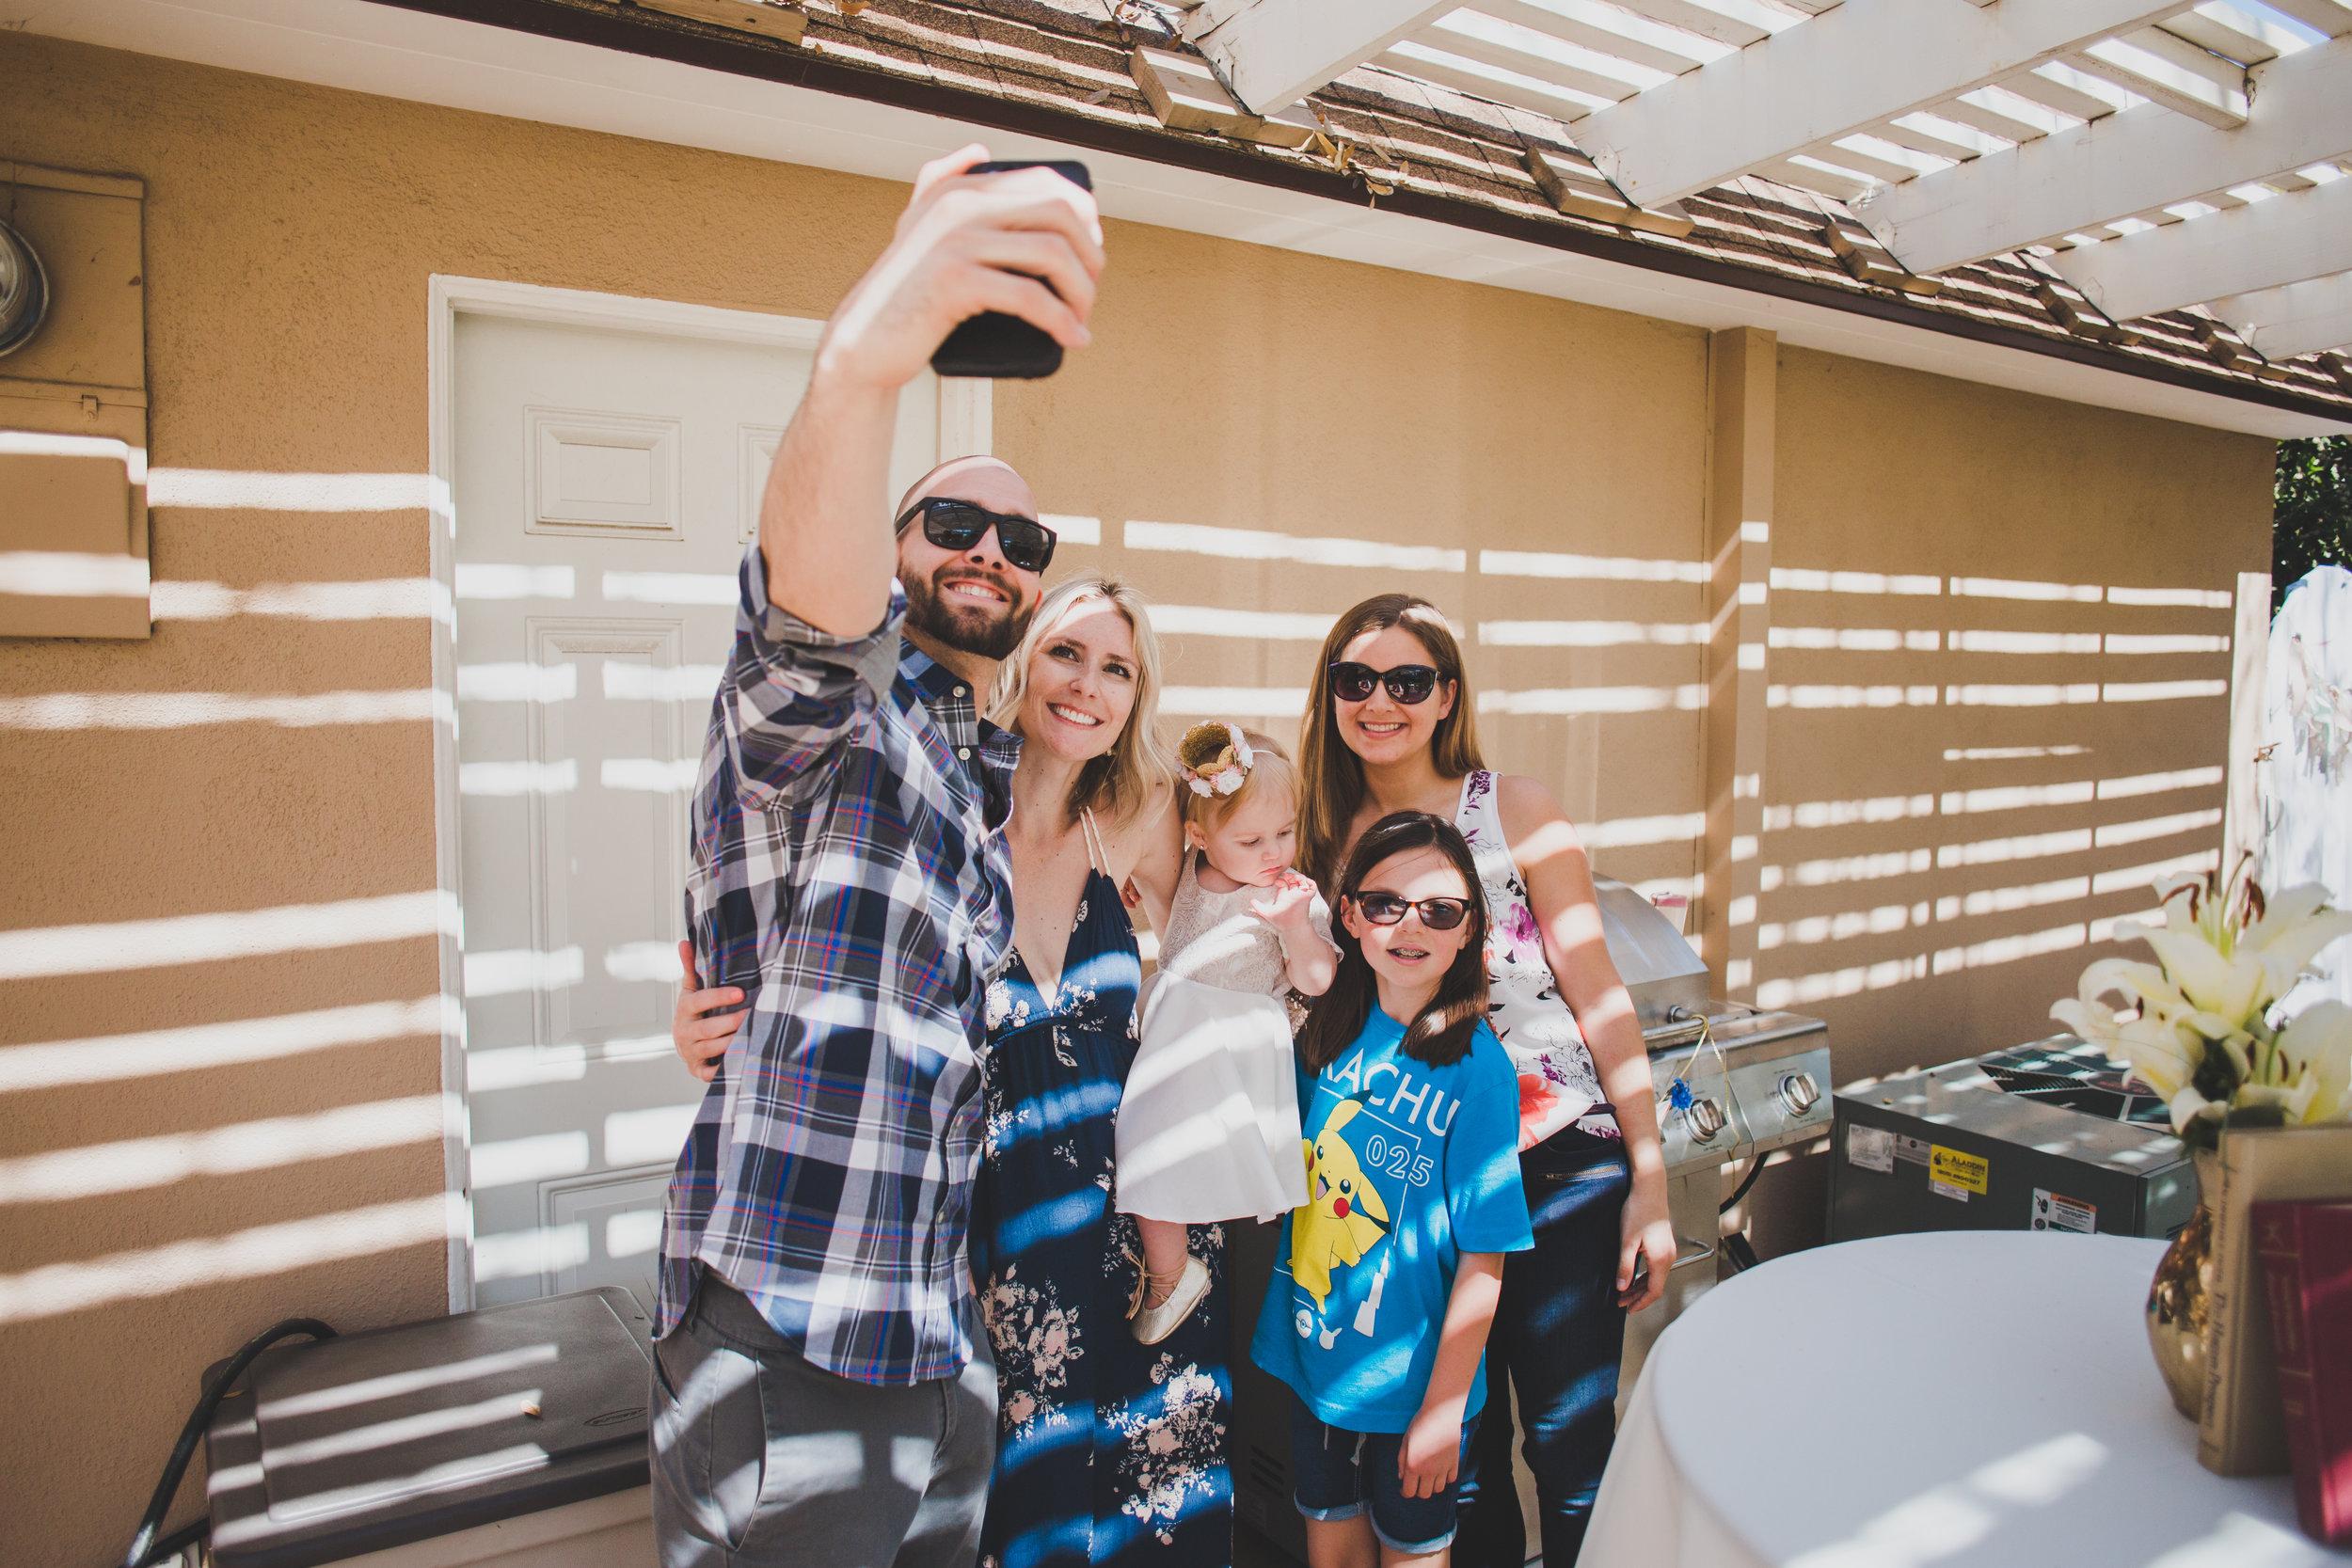 Custom Snapchat Fliter - First Birthday Party Ideas - A Vintage Chic Pi Day Themed 1st Birthday Party   Ava's First Birthday